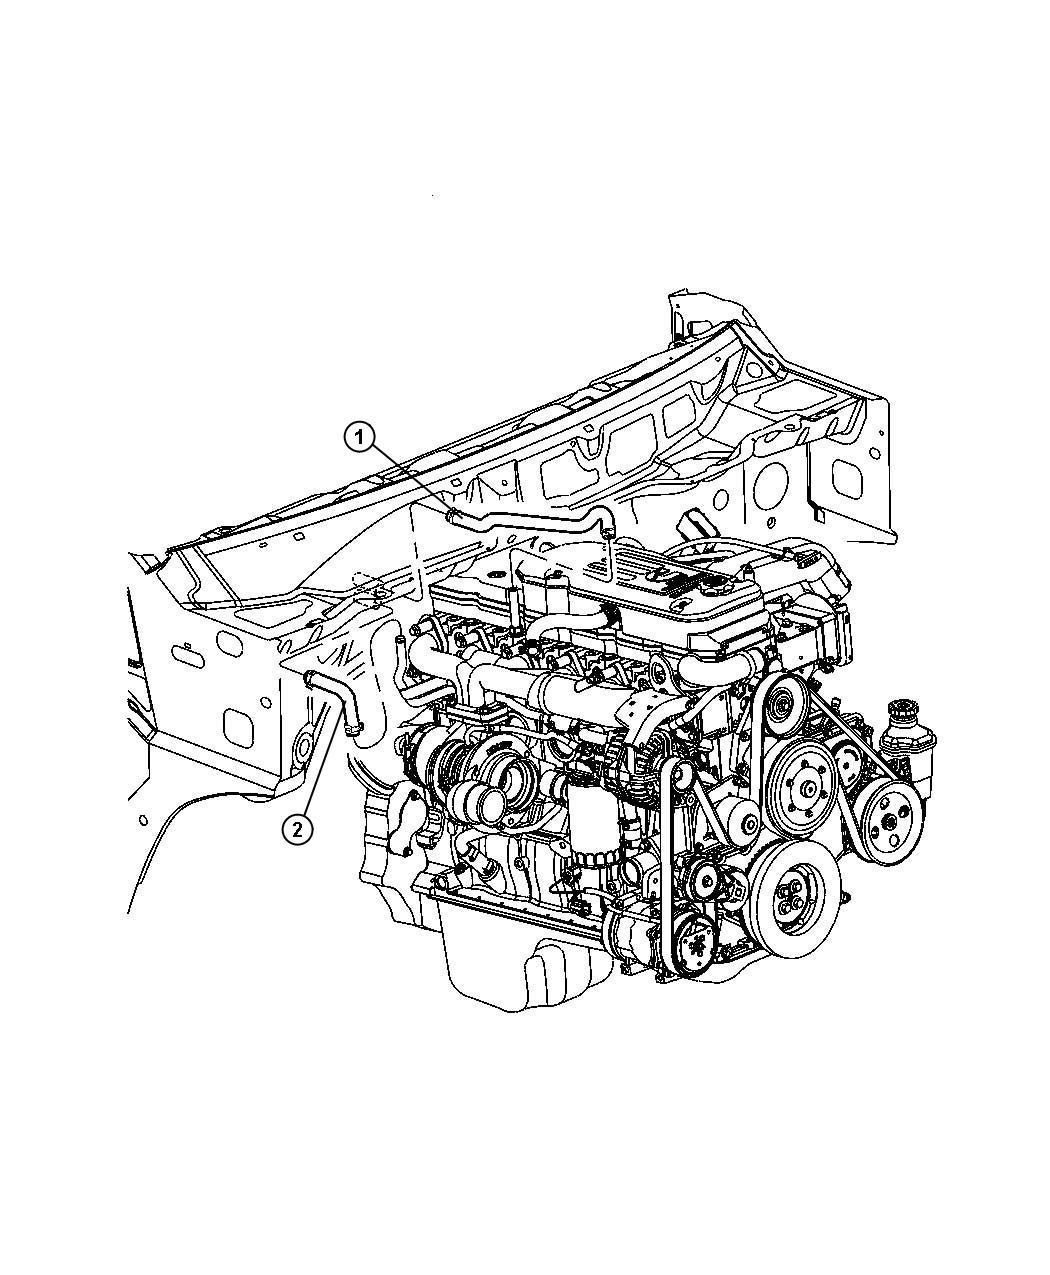 2007 Dodge Ram 3500 Hose  Heater  Heater Return  Plumbing